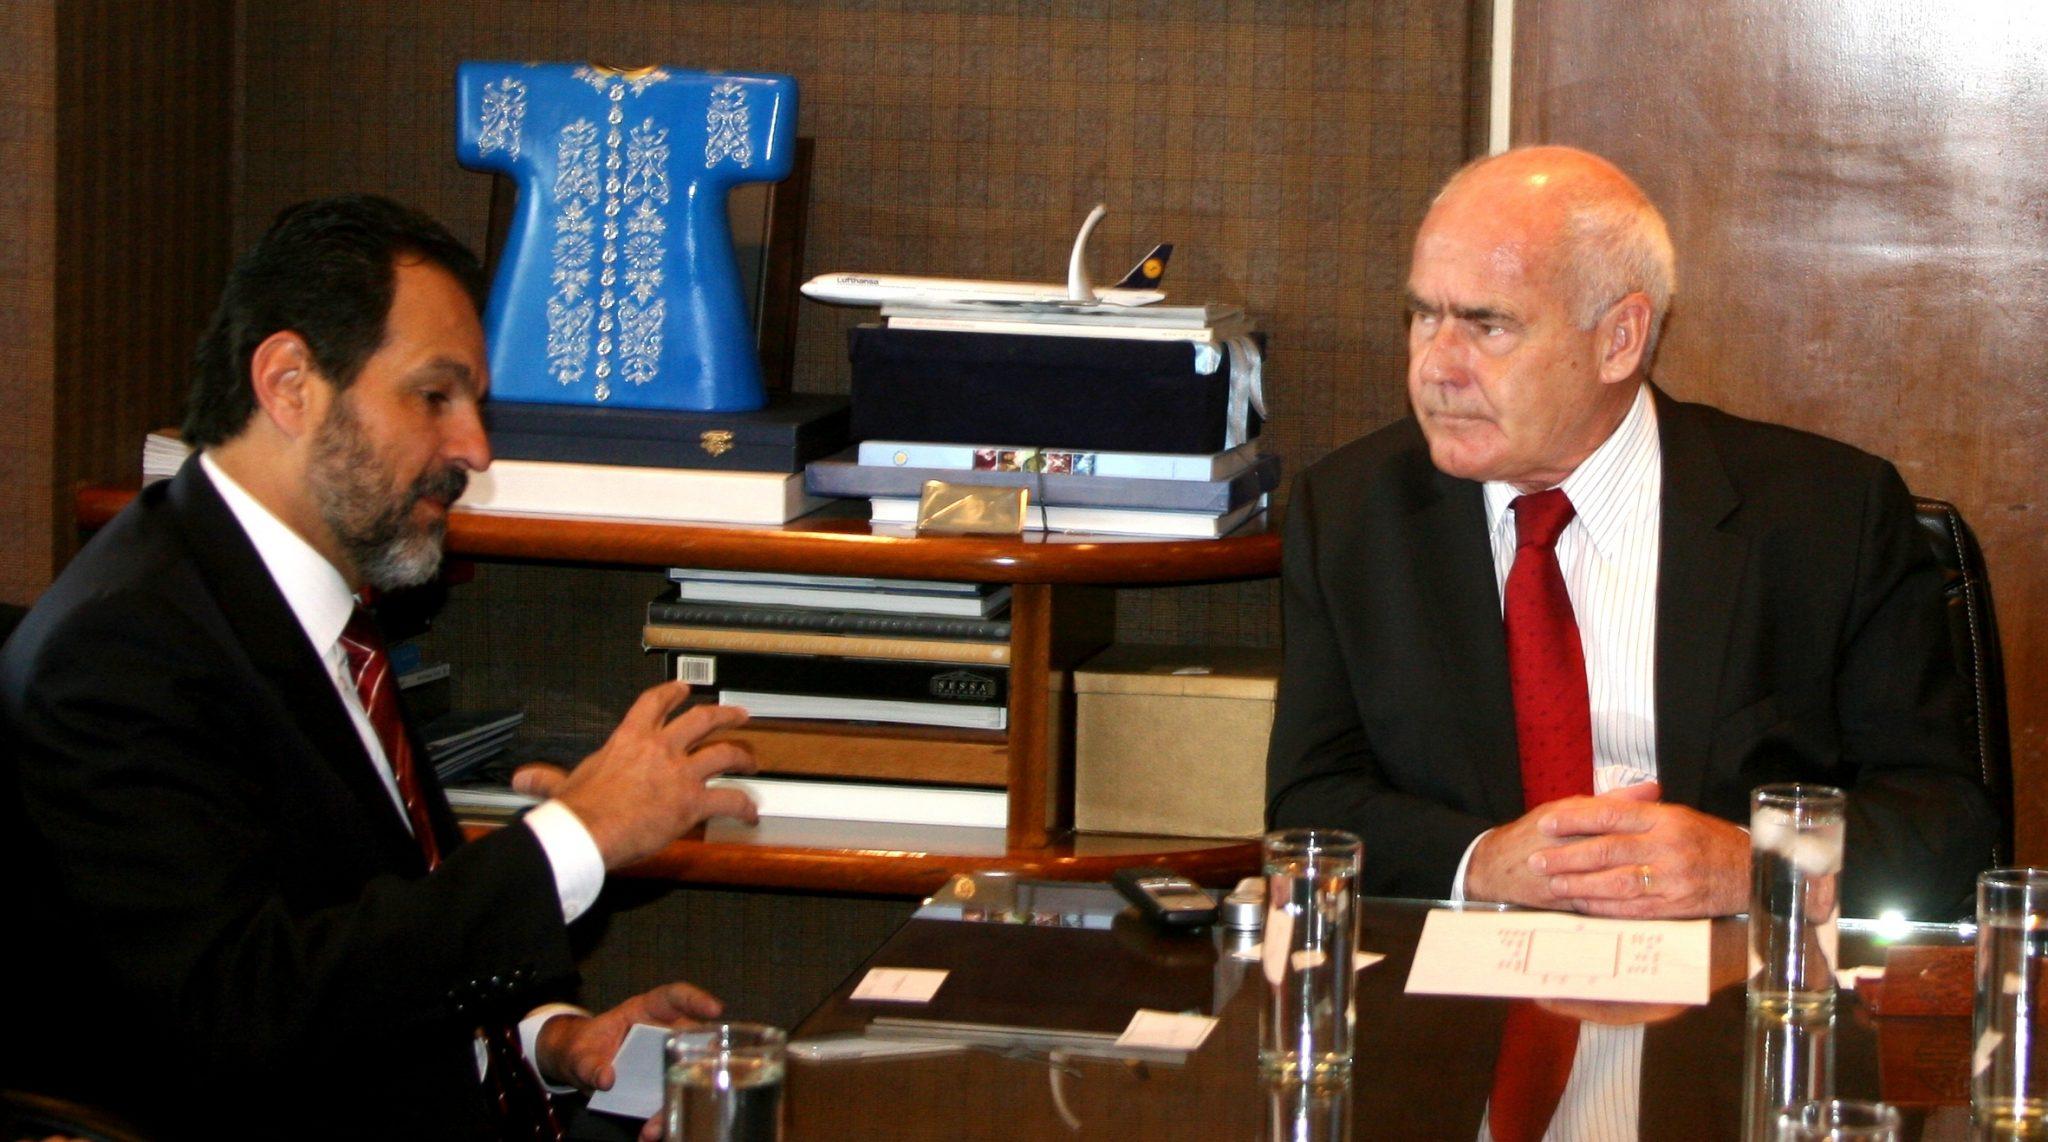 Meyer se reunió con el gobernador de Brasilia